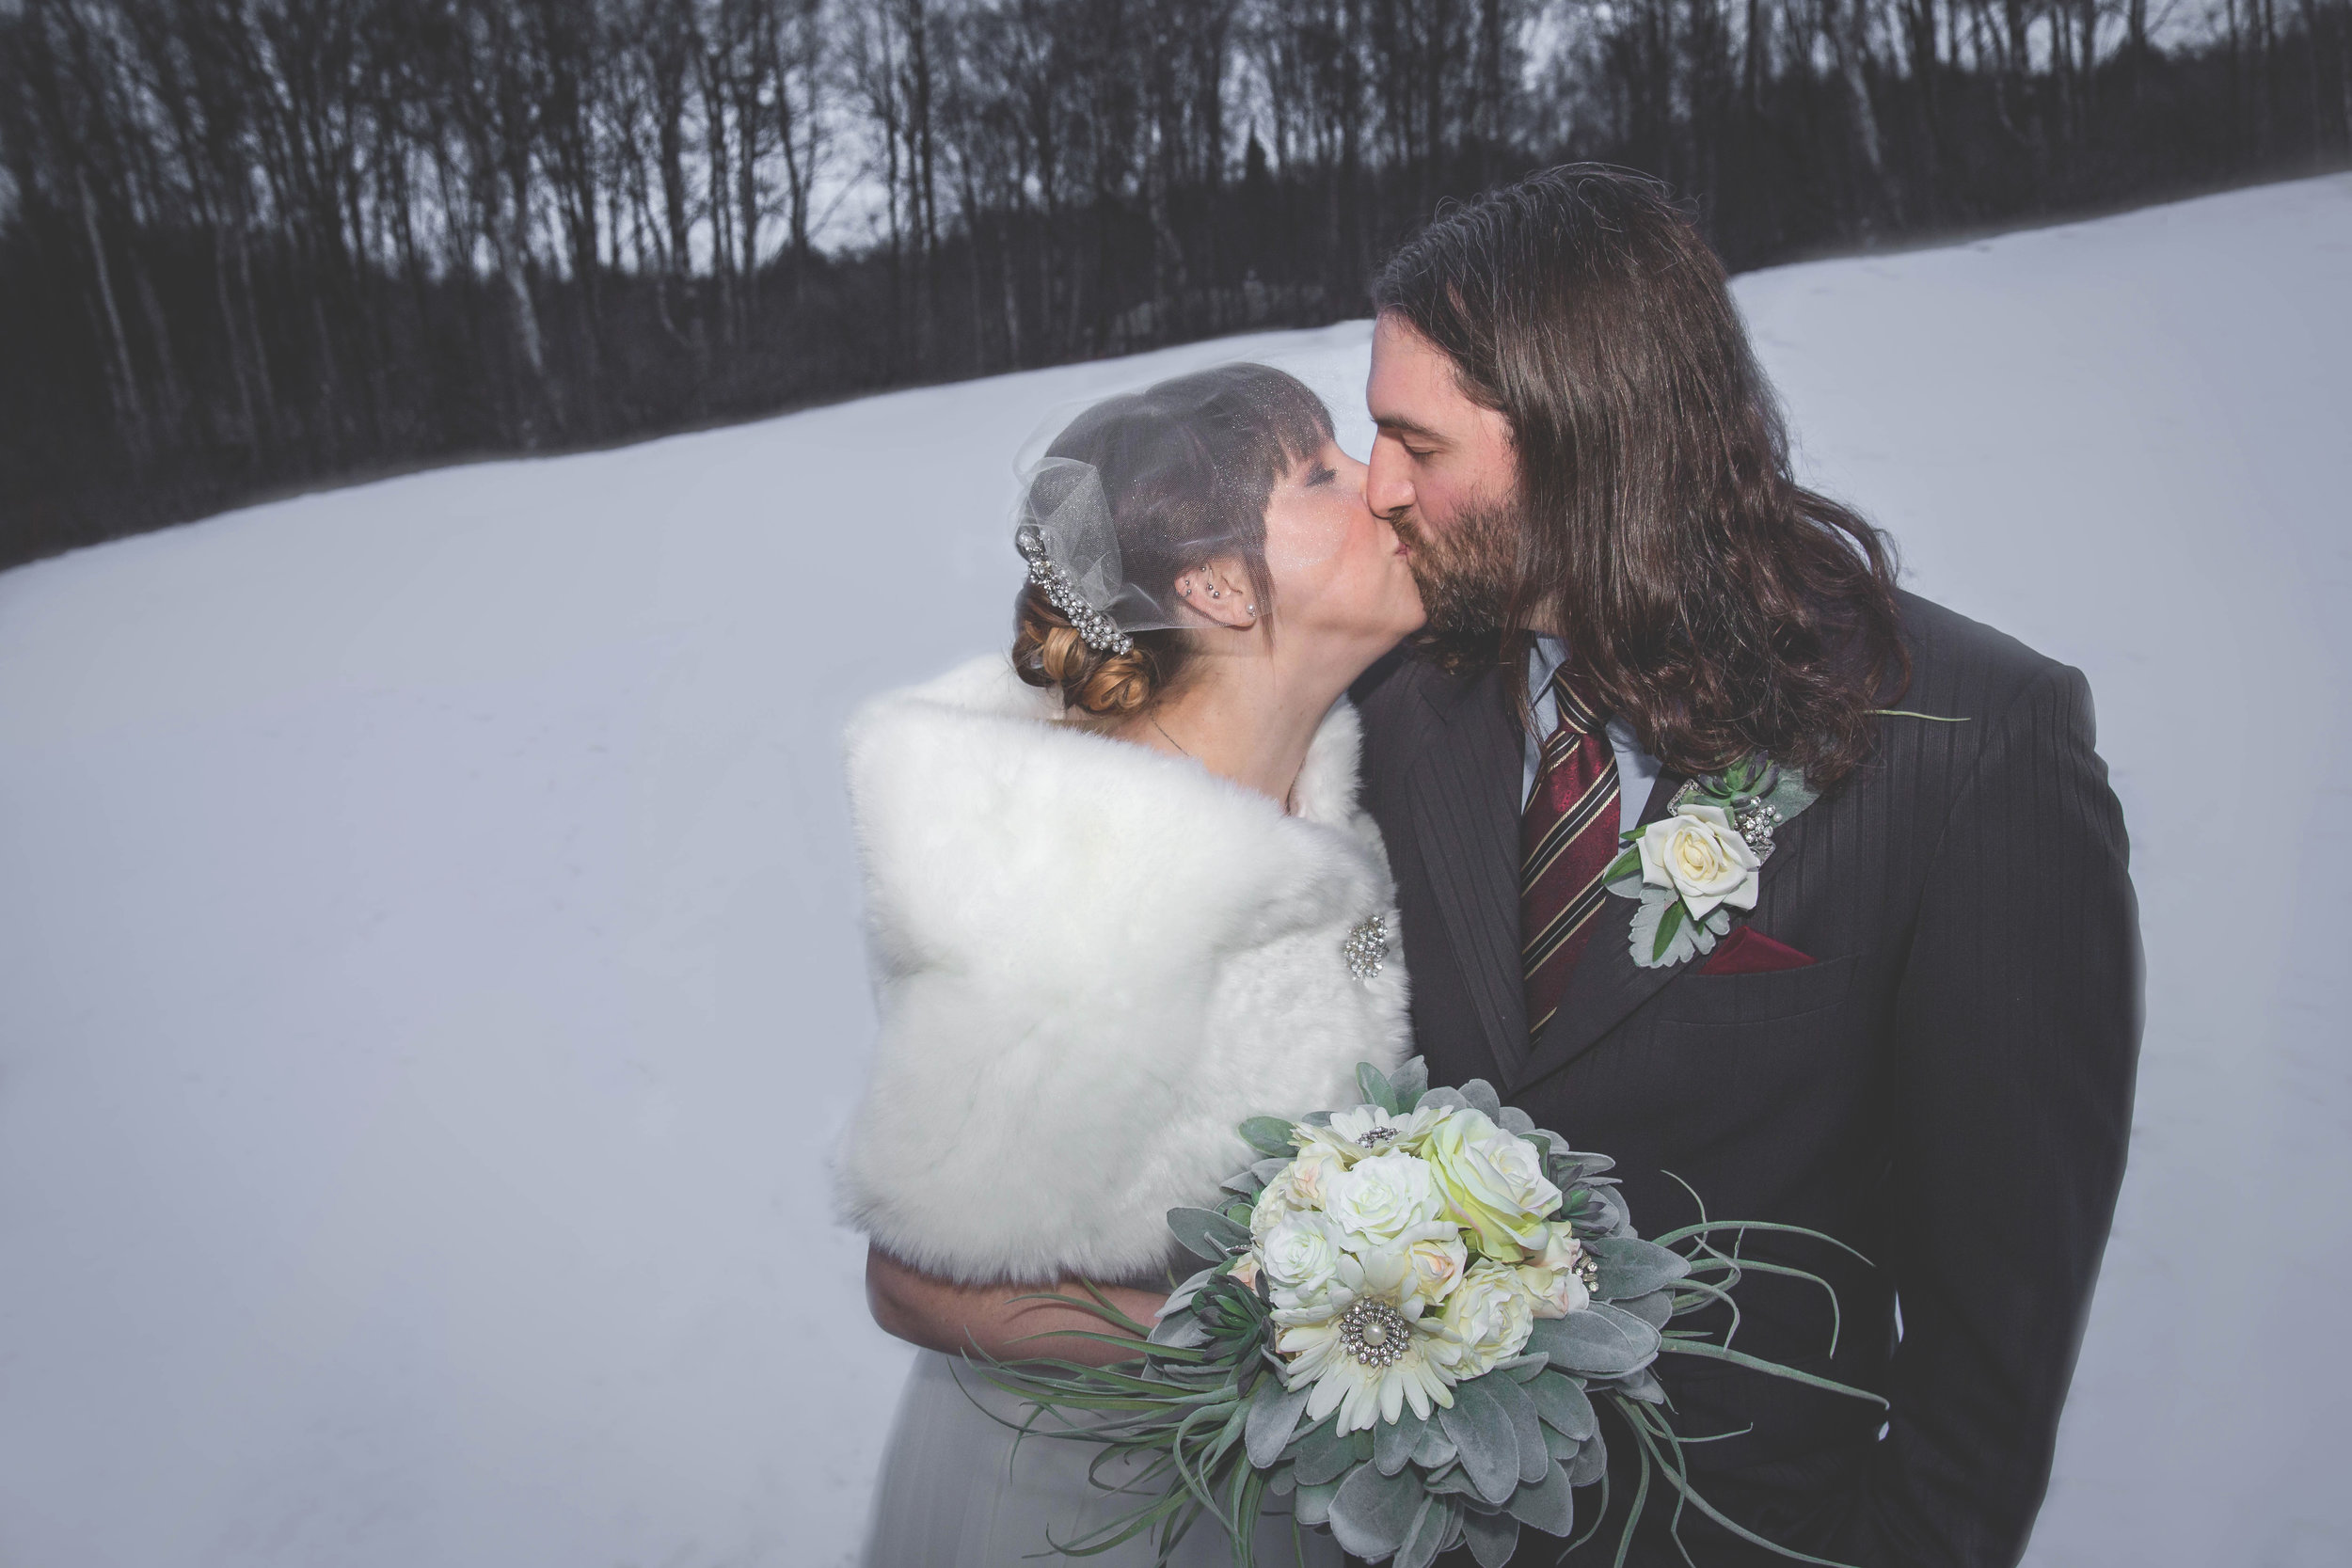 1 mckay ingalls wedding-2 copy.jpg